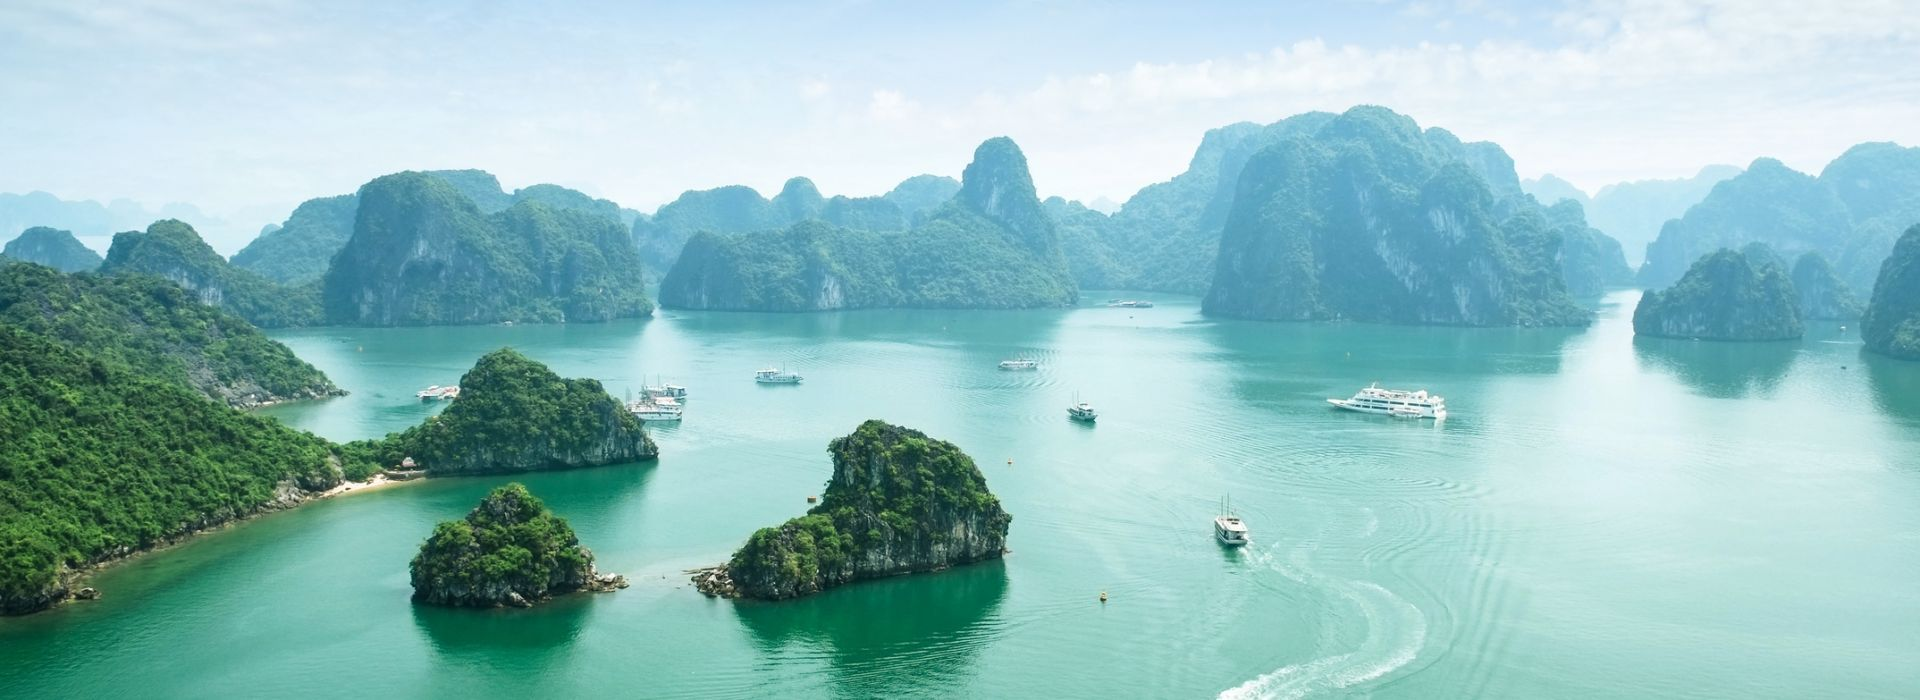 Farm and plantation visits Tours in Vietnam